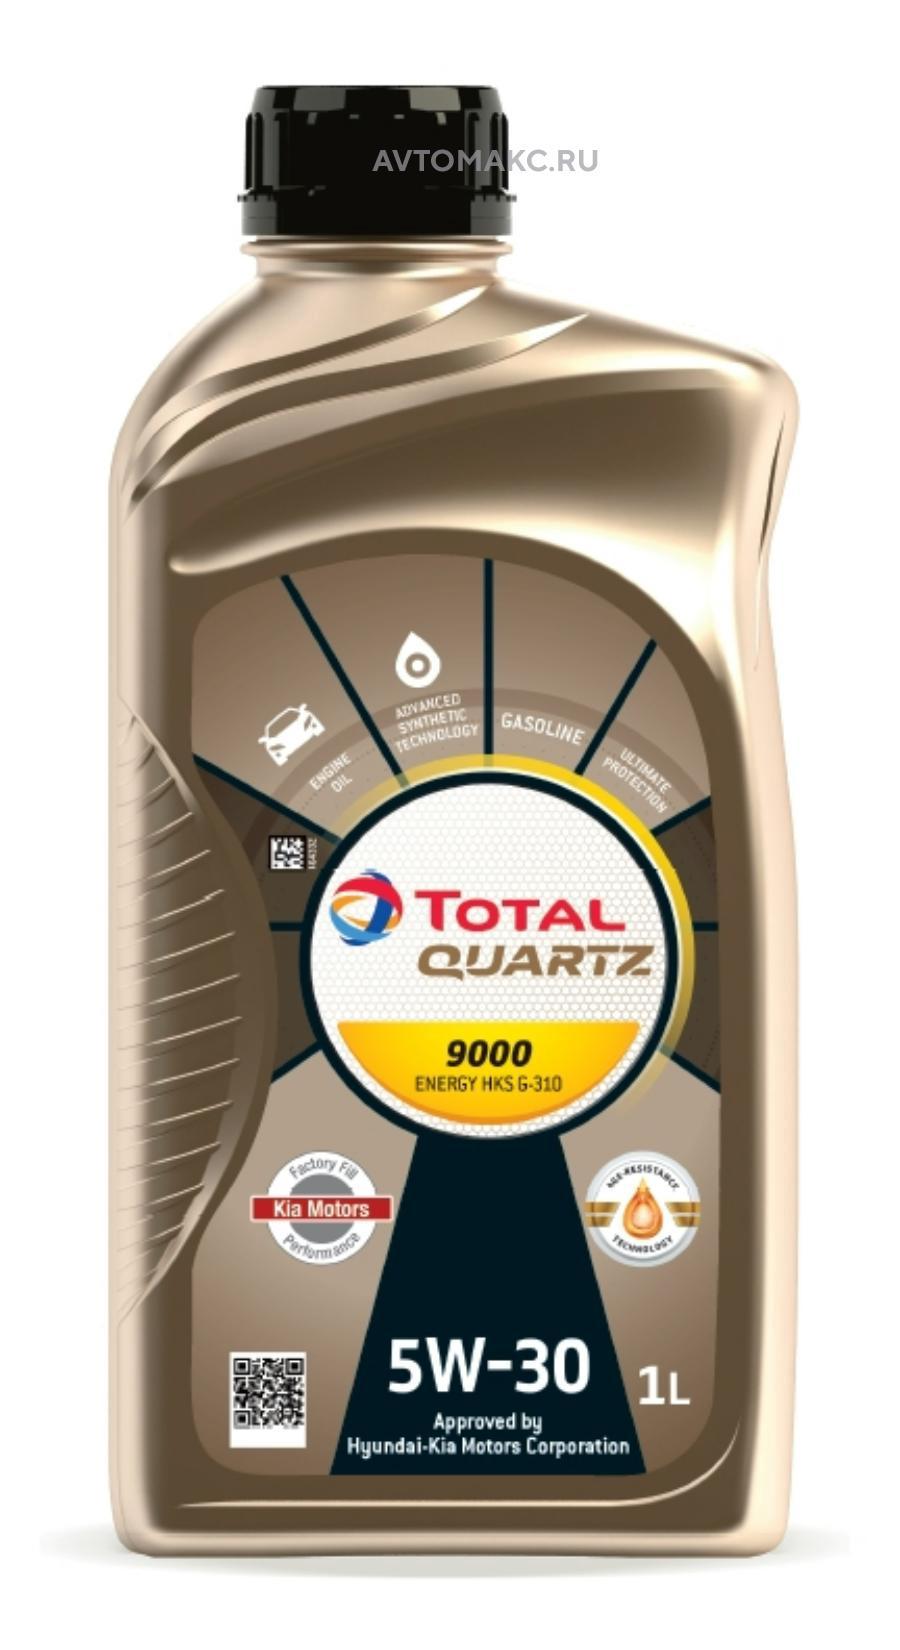 Масло моторное синтетическое QUARTZ 9000 ENERGY HKS 5W-30, 1л